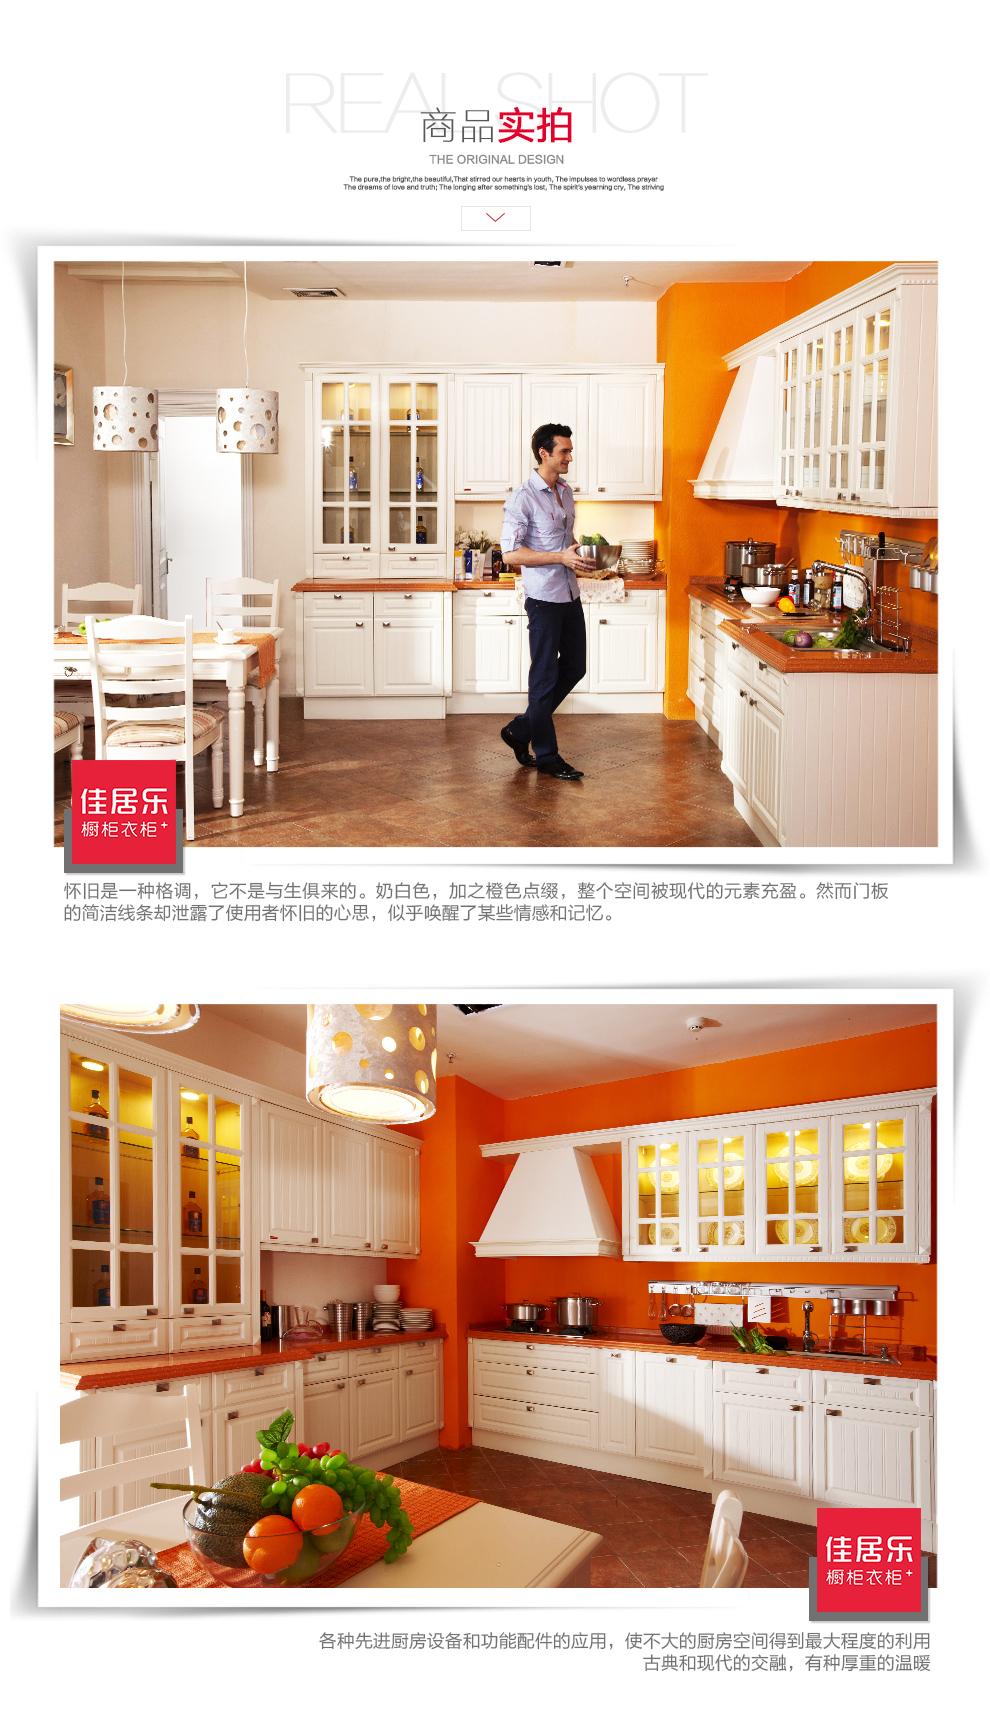 kitchen cabinets sets kohler sinks porcelain 居乐厨柜台面厨房橱柜橱柜设计 www thetupian com 佳居乐整体厨房定做橱柜台面厨房装修设计厨柜套装组合欧式